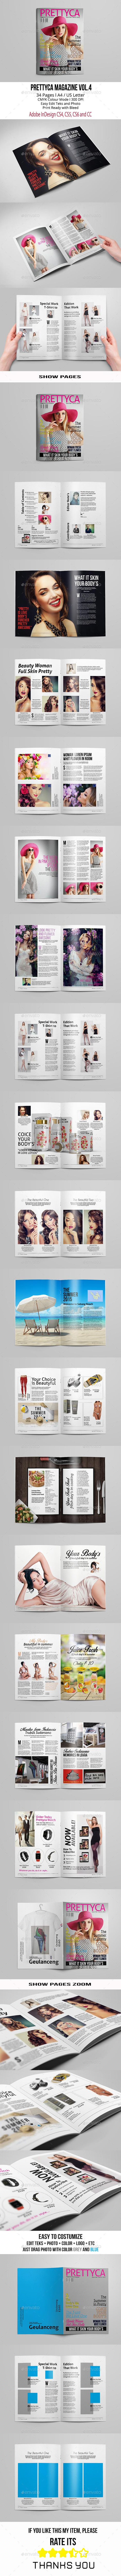 Prettyca Magazine Vol.4 A4/US Letter - Magazines Print Templates